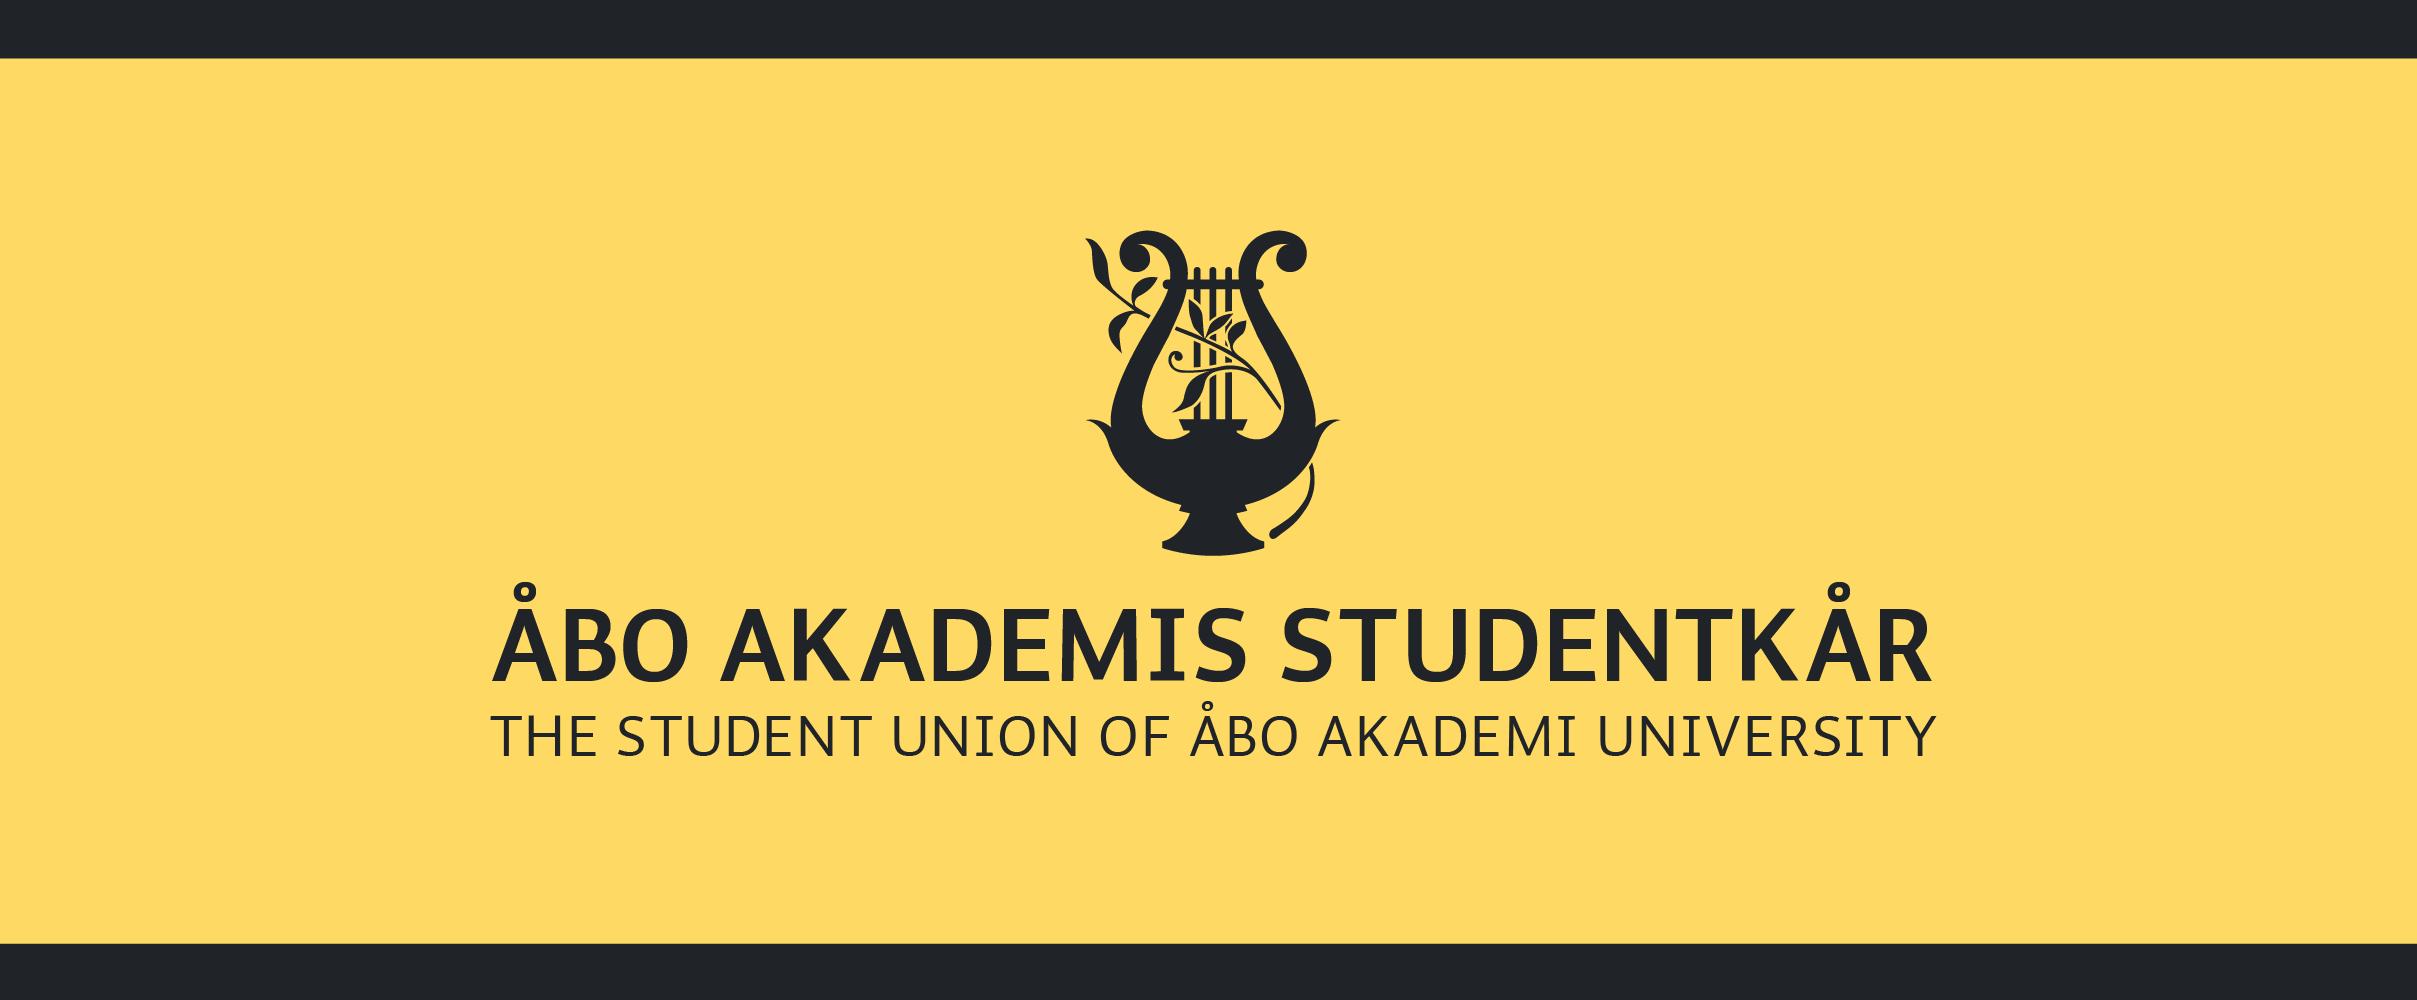 Åbo Akademis Studentkårs svarta logo på ljusgul bakgrund